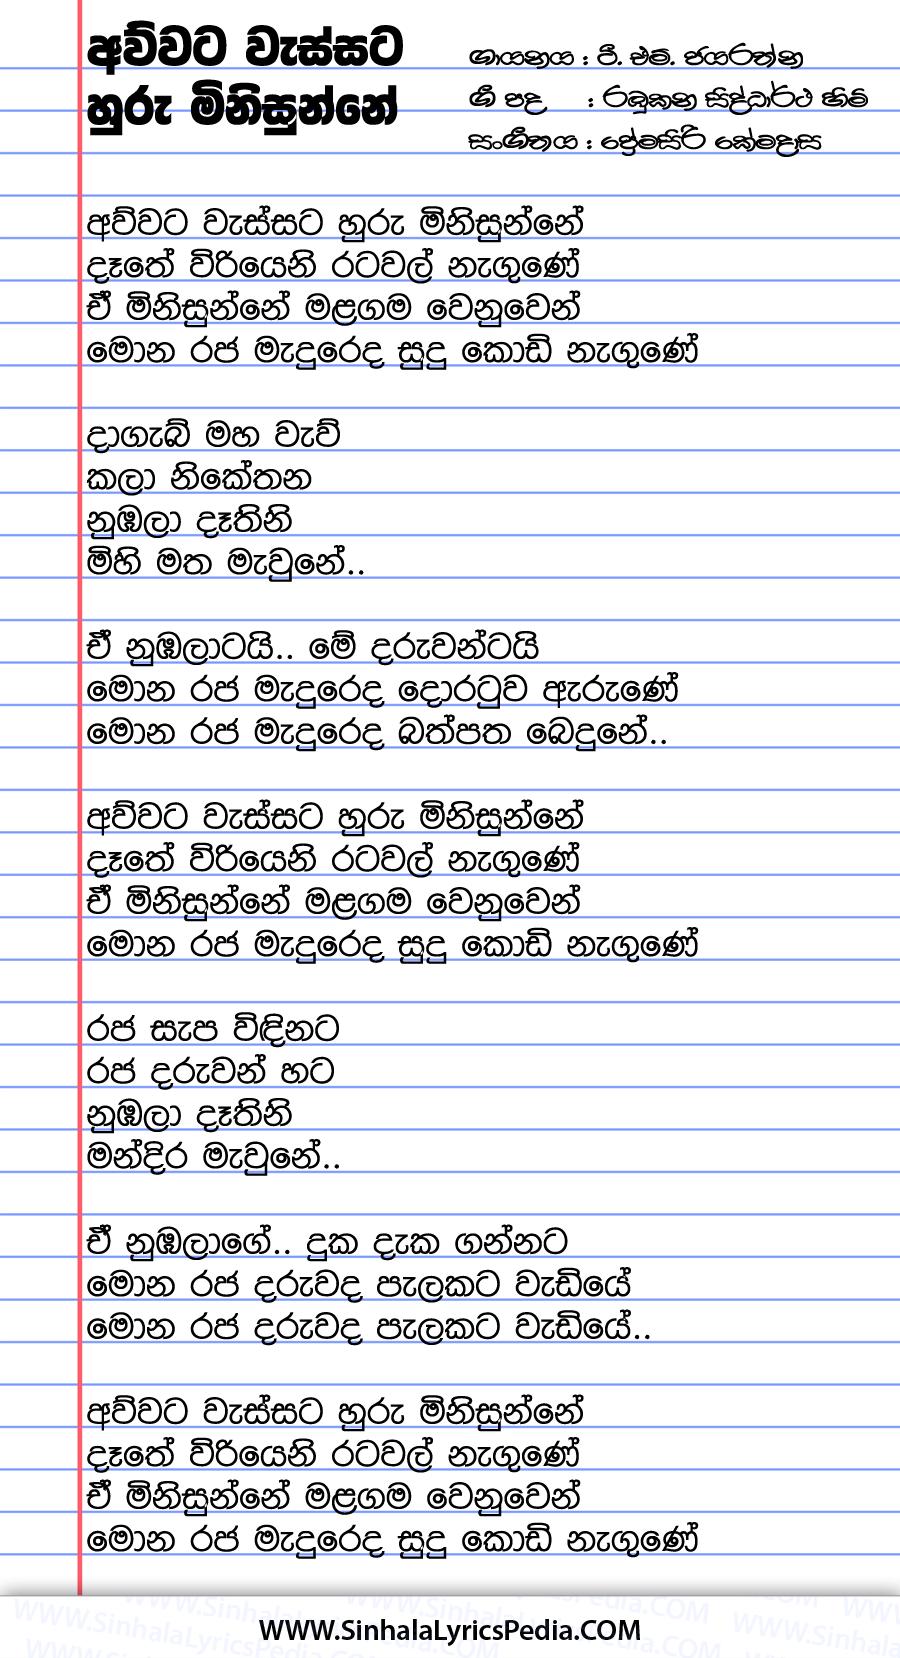 Awwata Wassata Huru Minisunne Song Lyrics